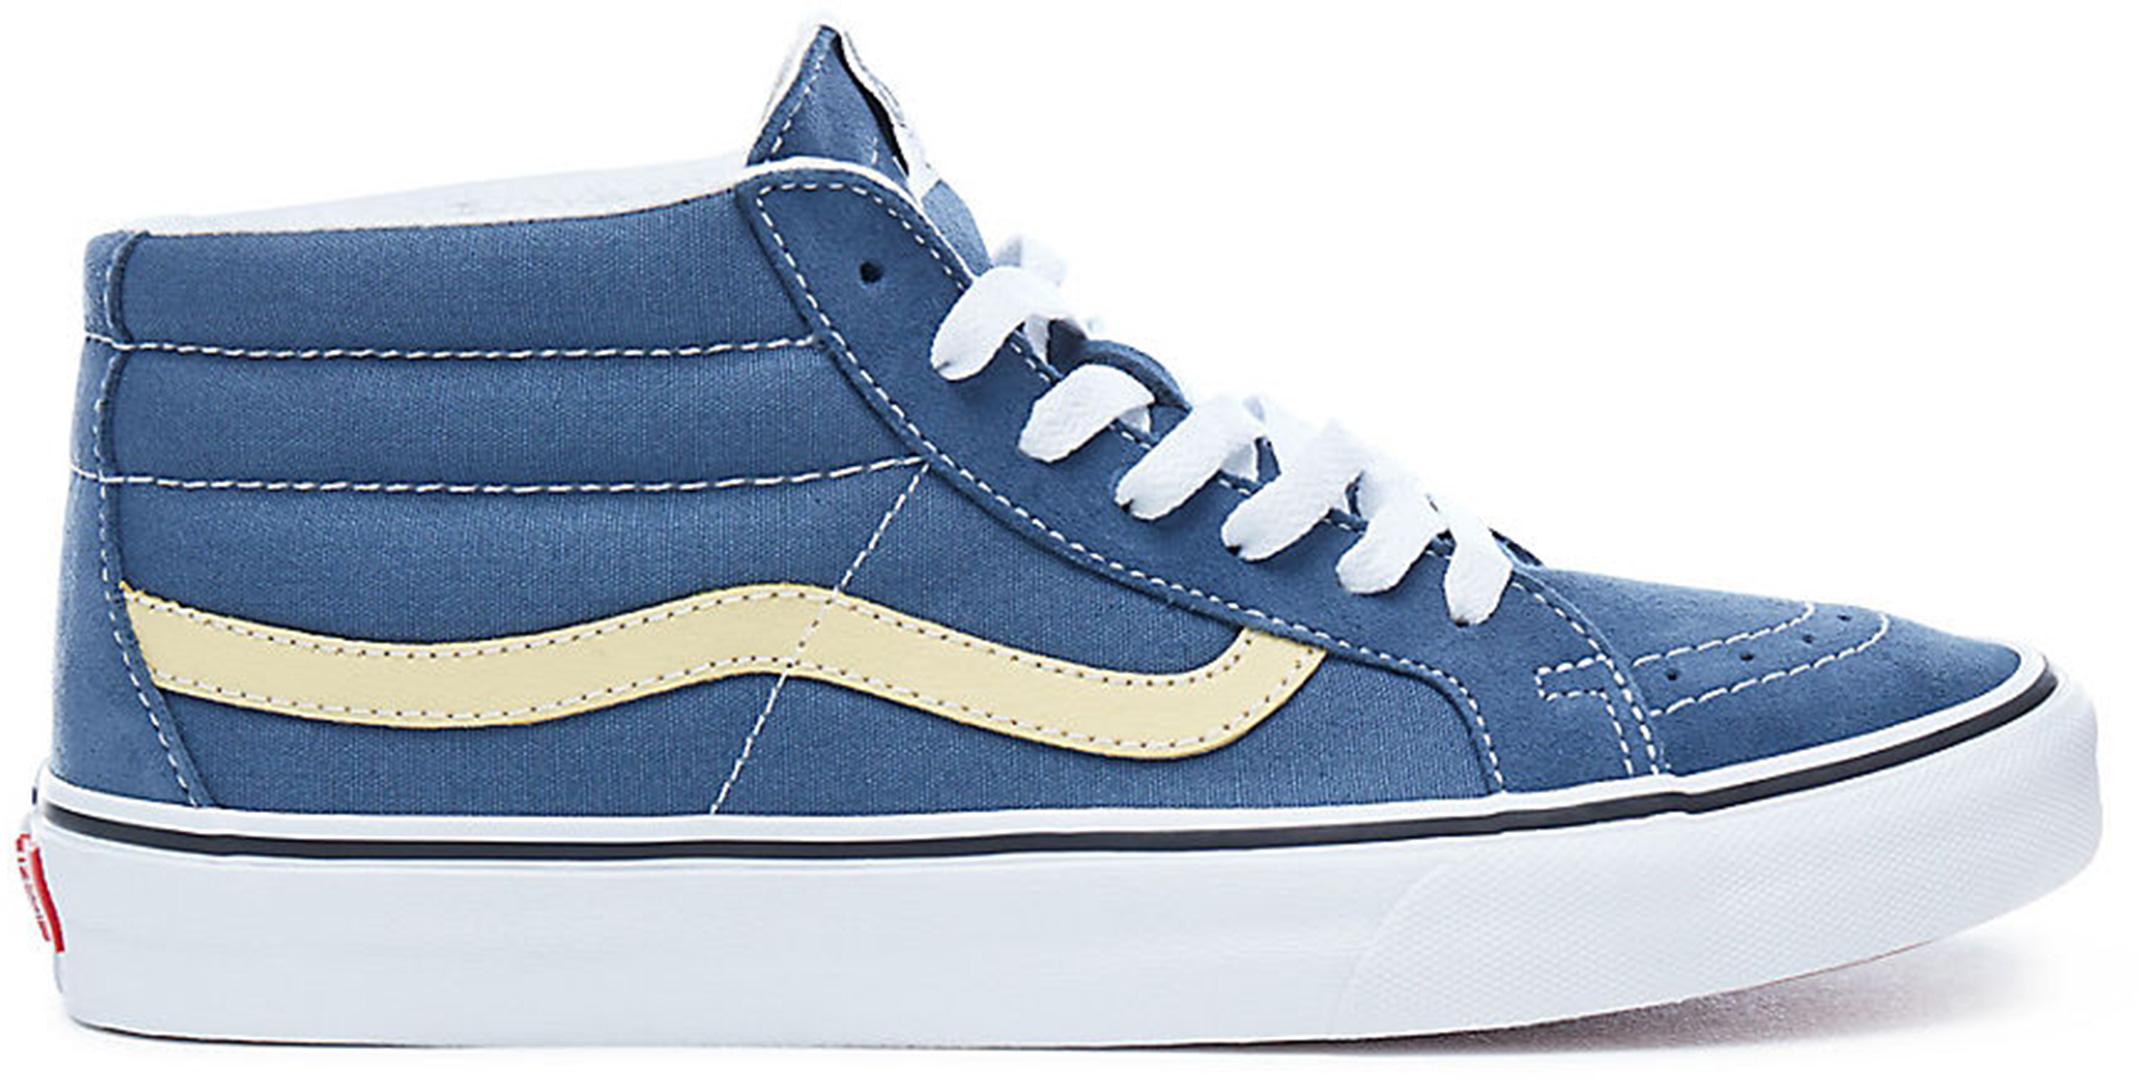 Vans 2018 SK8-MID REISSUE Schuh 2018 Vans vintage indigo/pinapple slice zapatos 2580ab